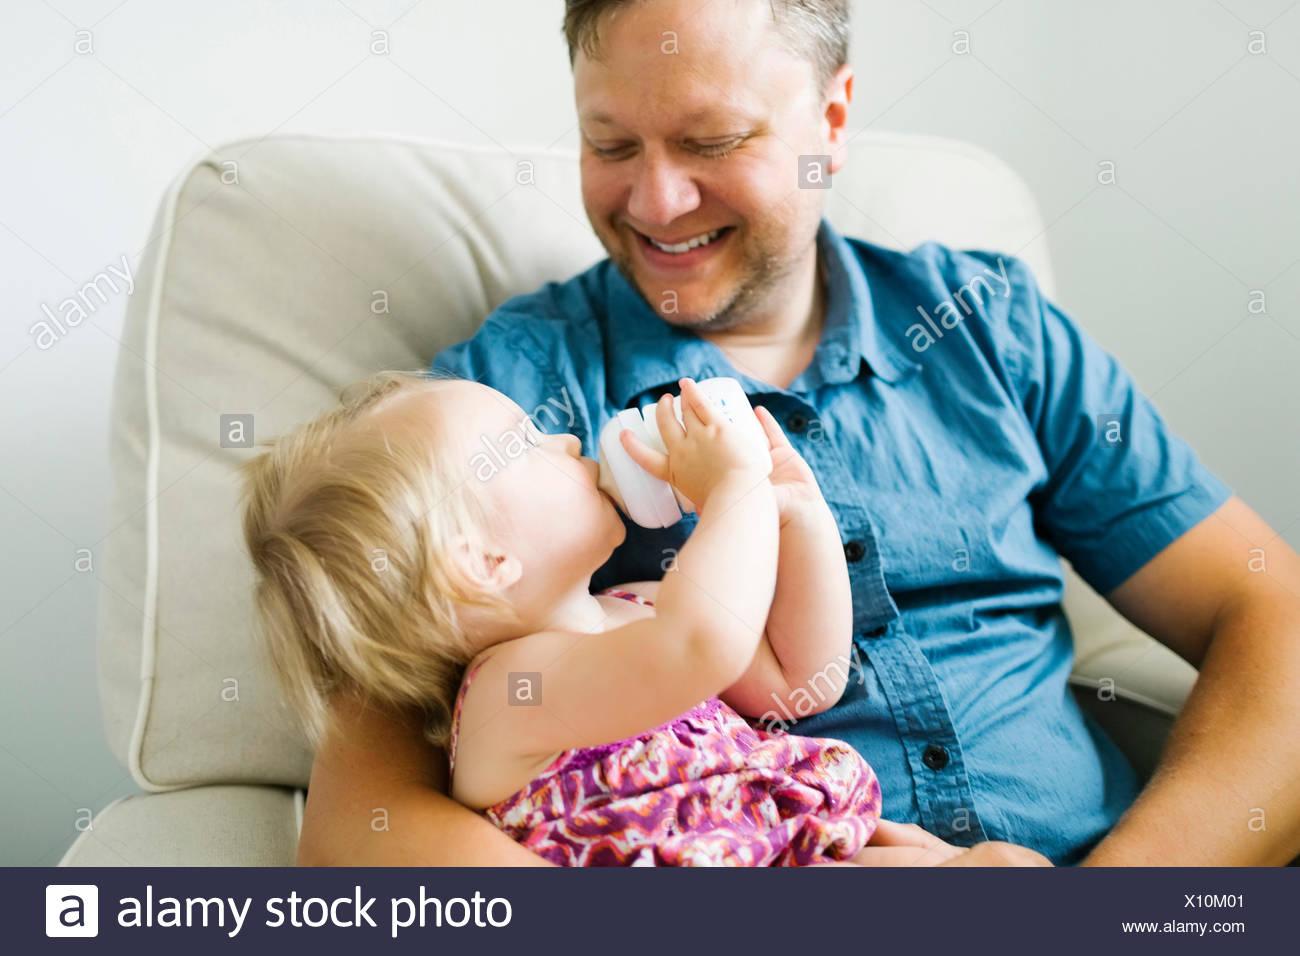 Vater feeding baby girl (12-17 Monate) im Wohnzimmer. Stockfoto